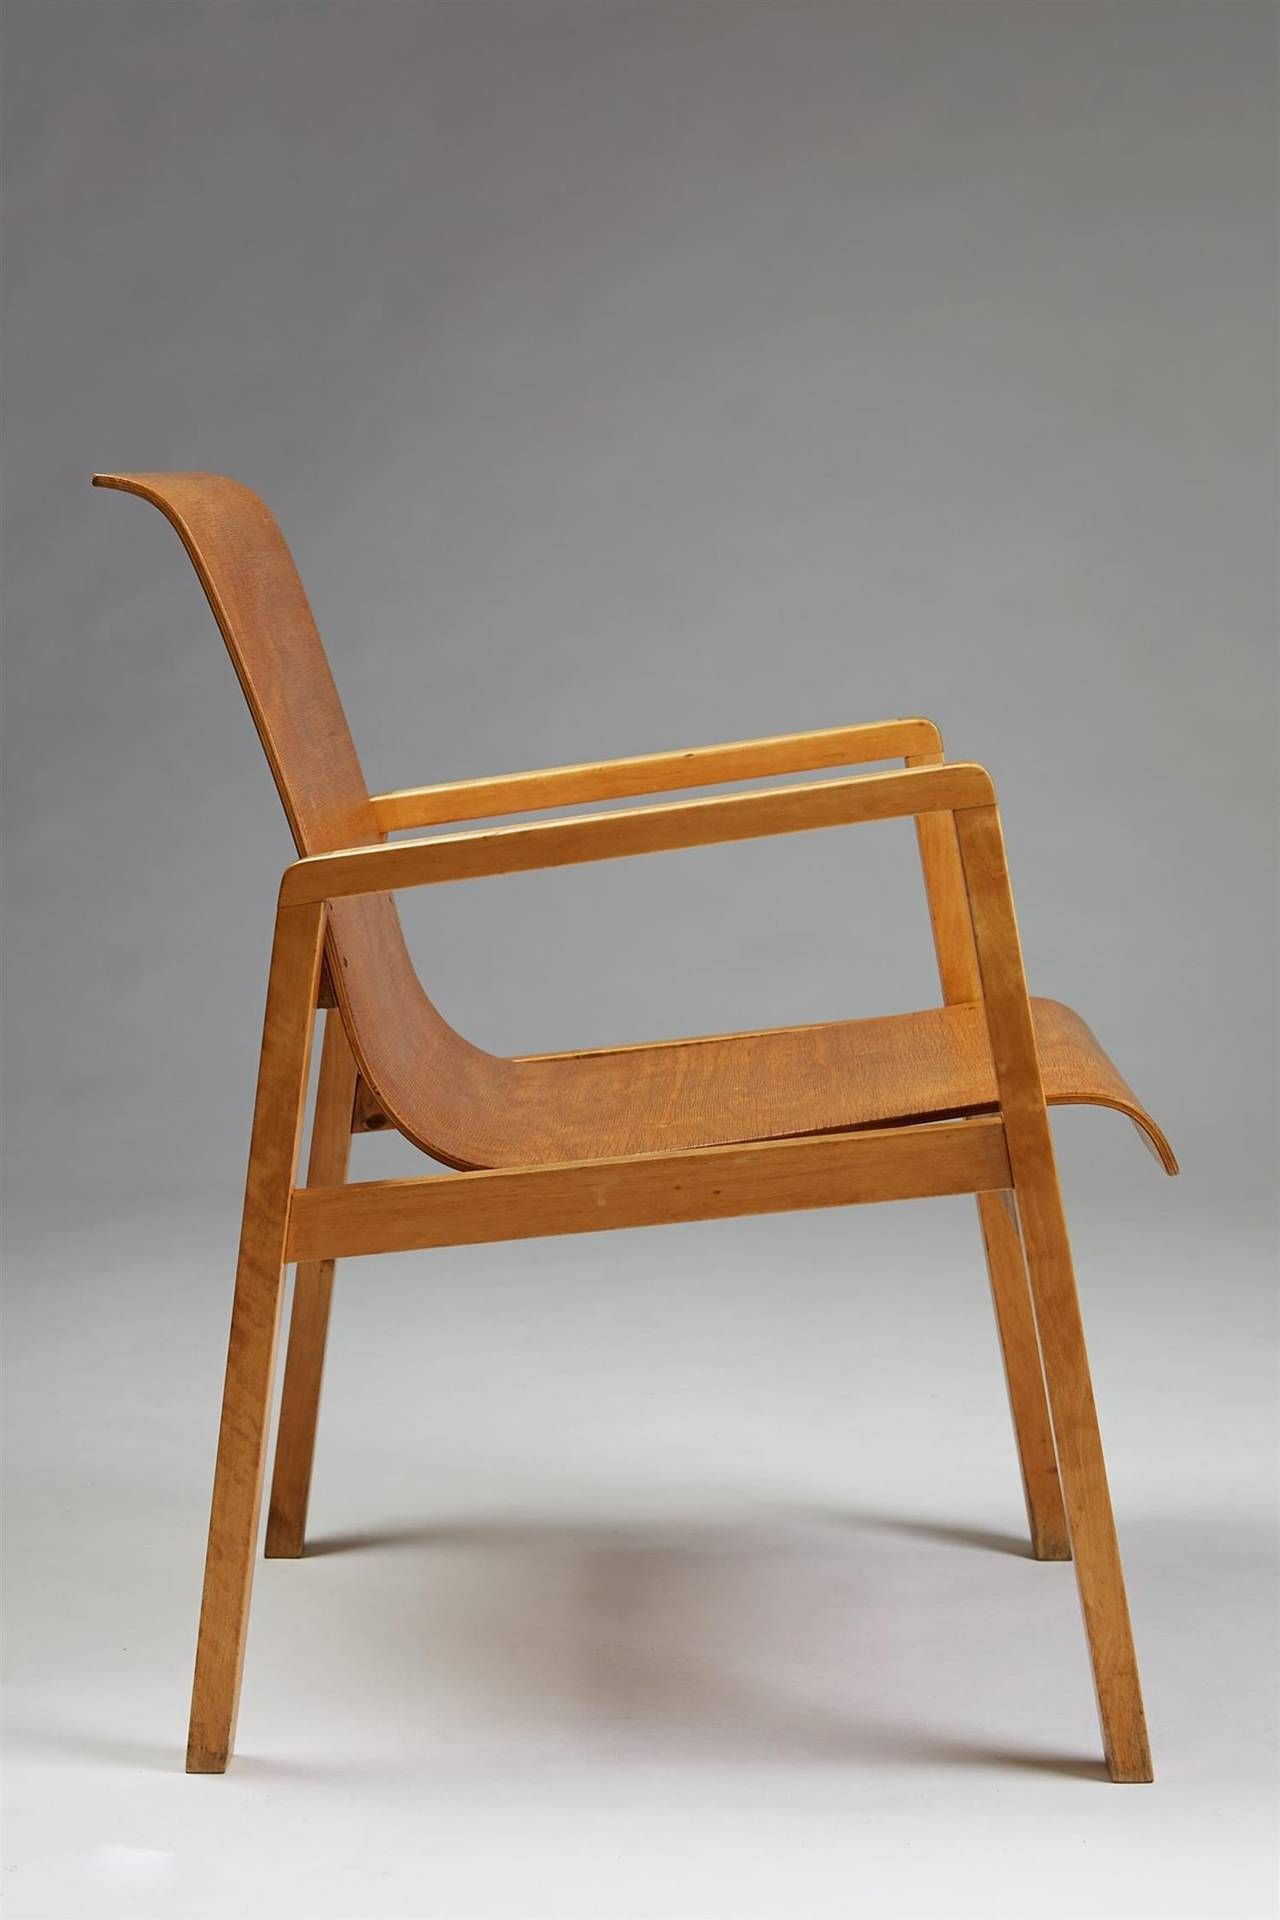 Chair Designed By Alvar Aalto For Artek Finland 1950s Scandinavian Furniture Design Alvar Aalto Chair Design